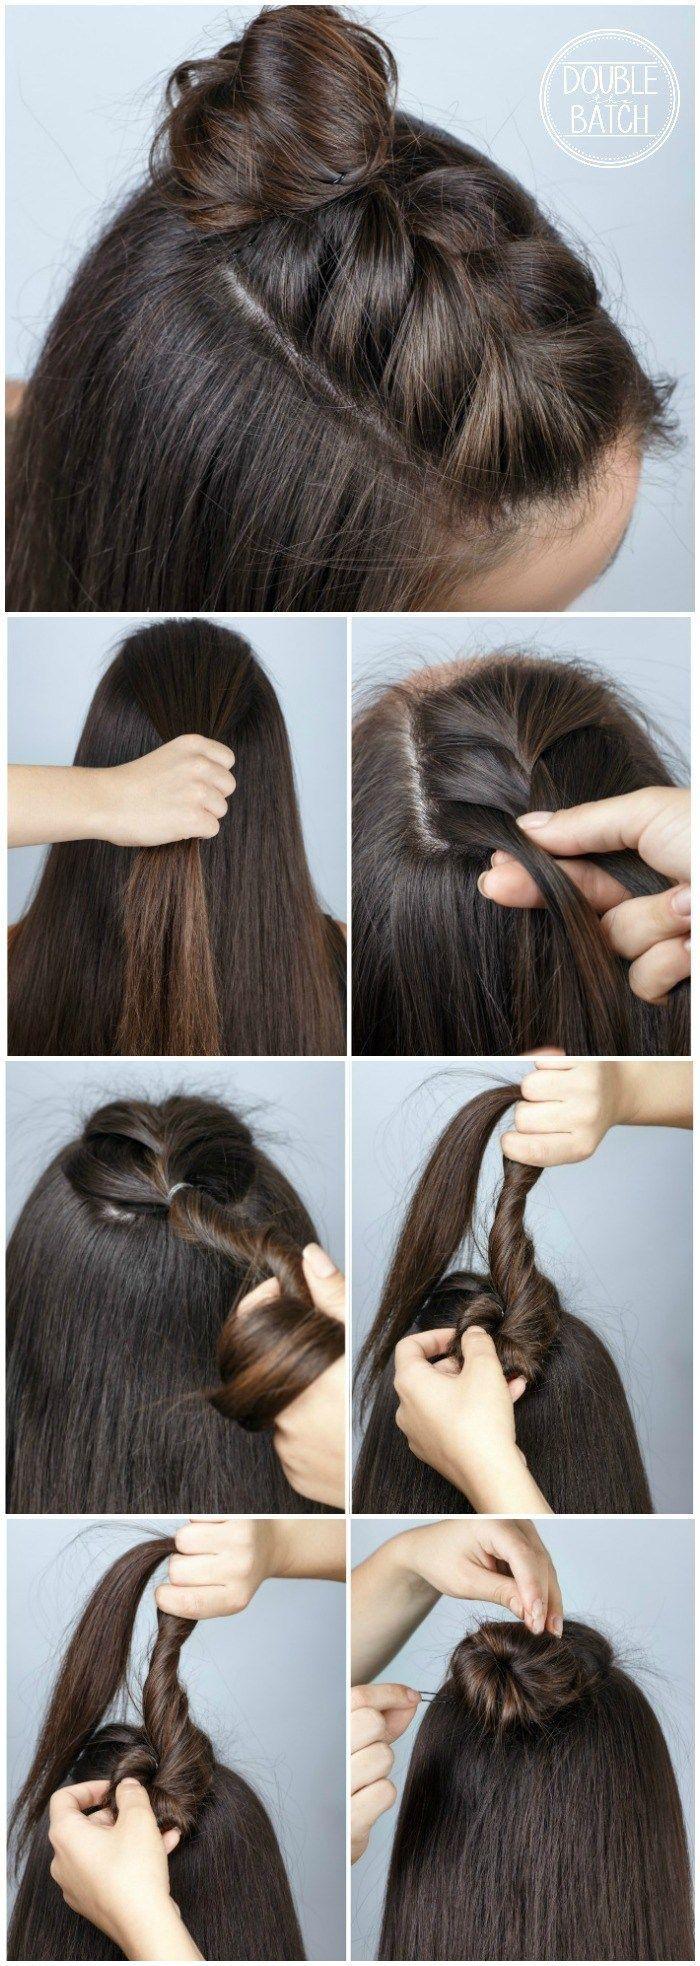 Easy Hair Ideas For School  braid bun  Beauty Haircut